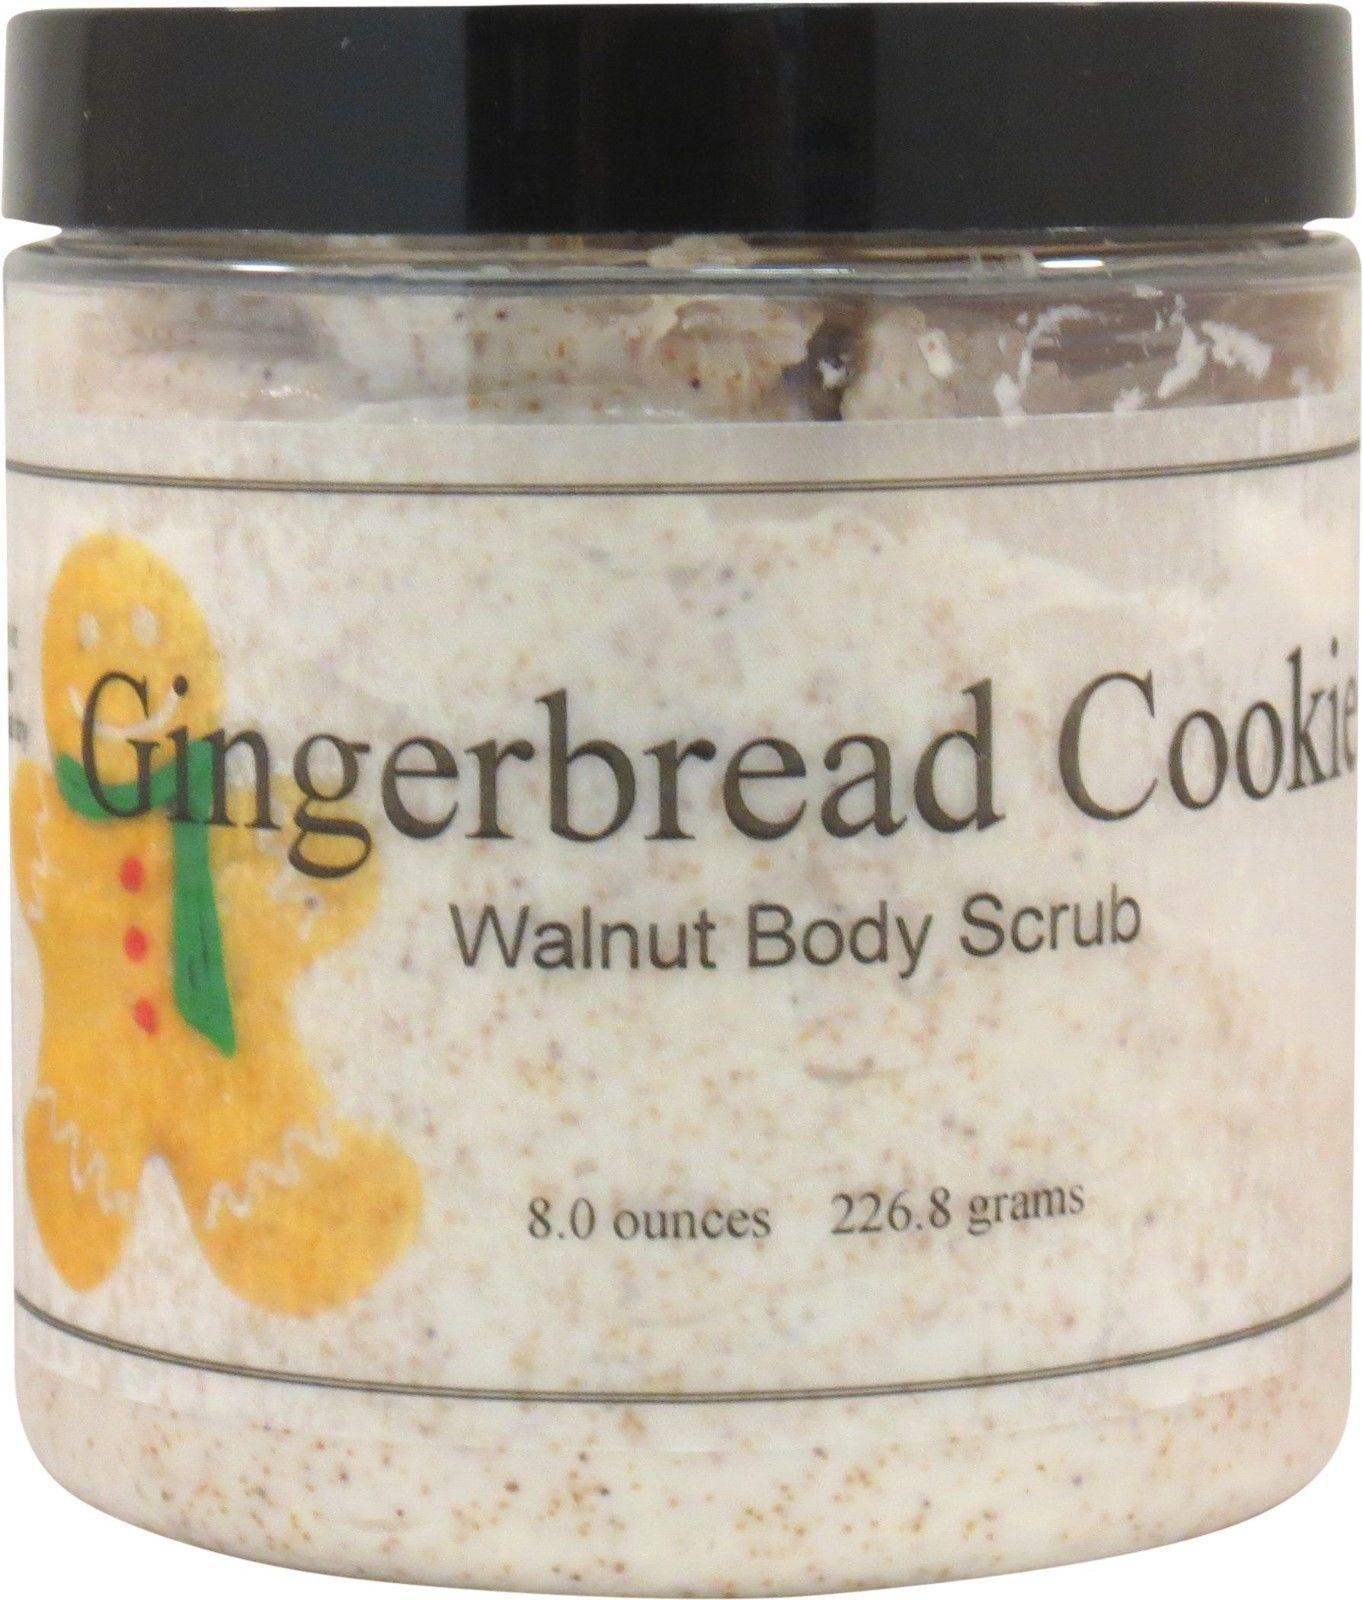 Gingerbread Cookie Walnut Body Scrub